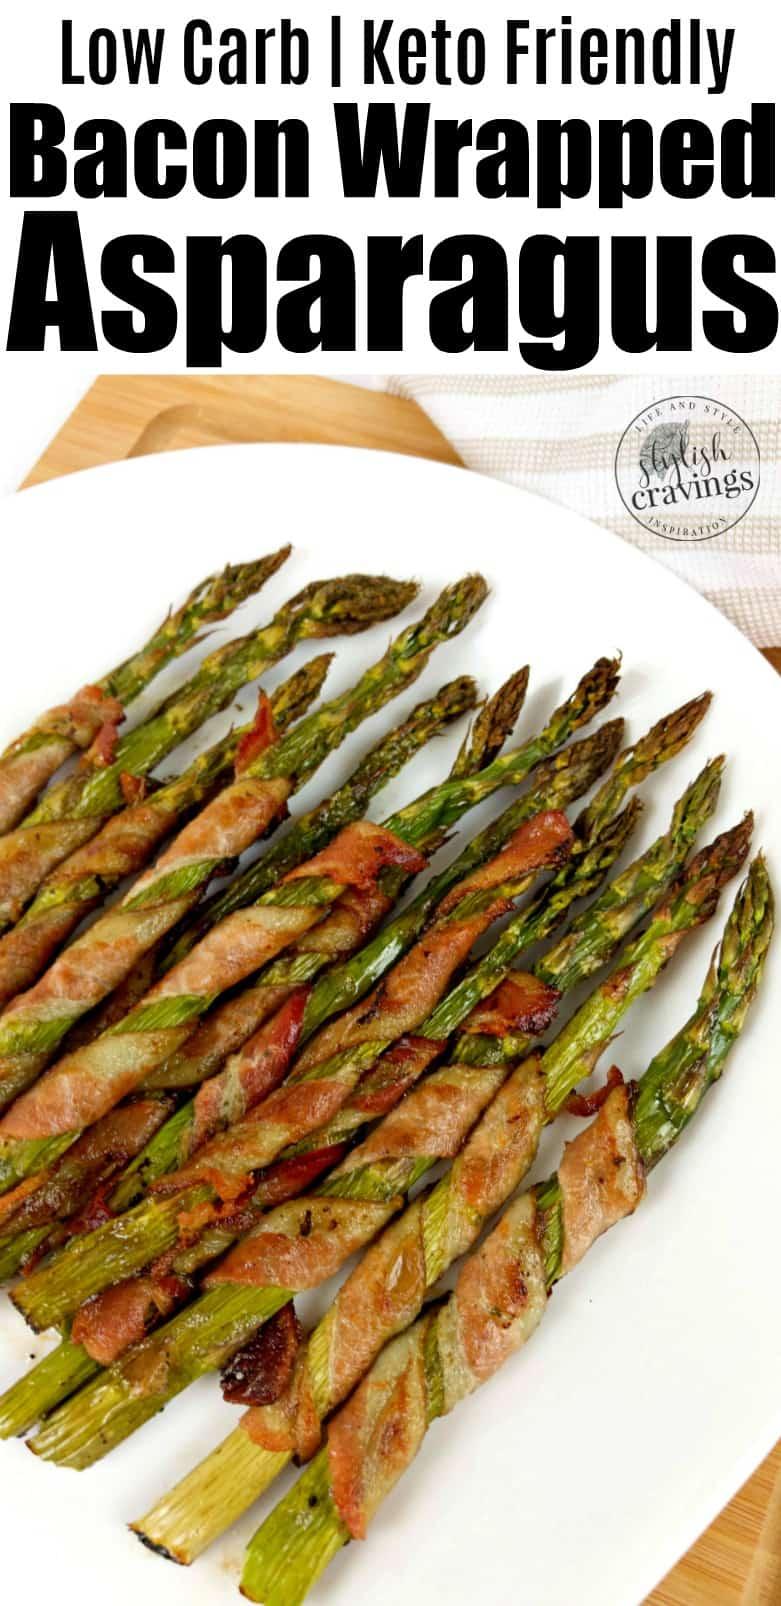 Keto Bacon Wrapped Asparagus